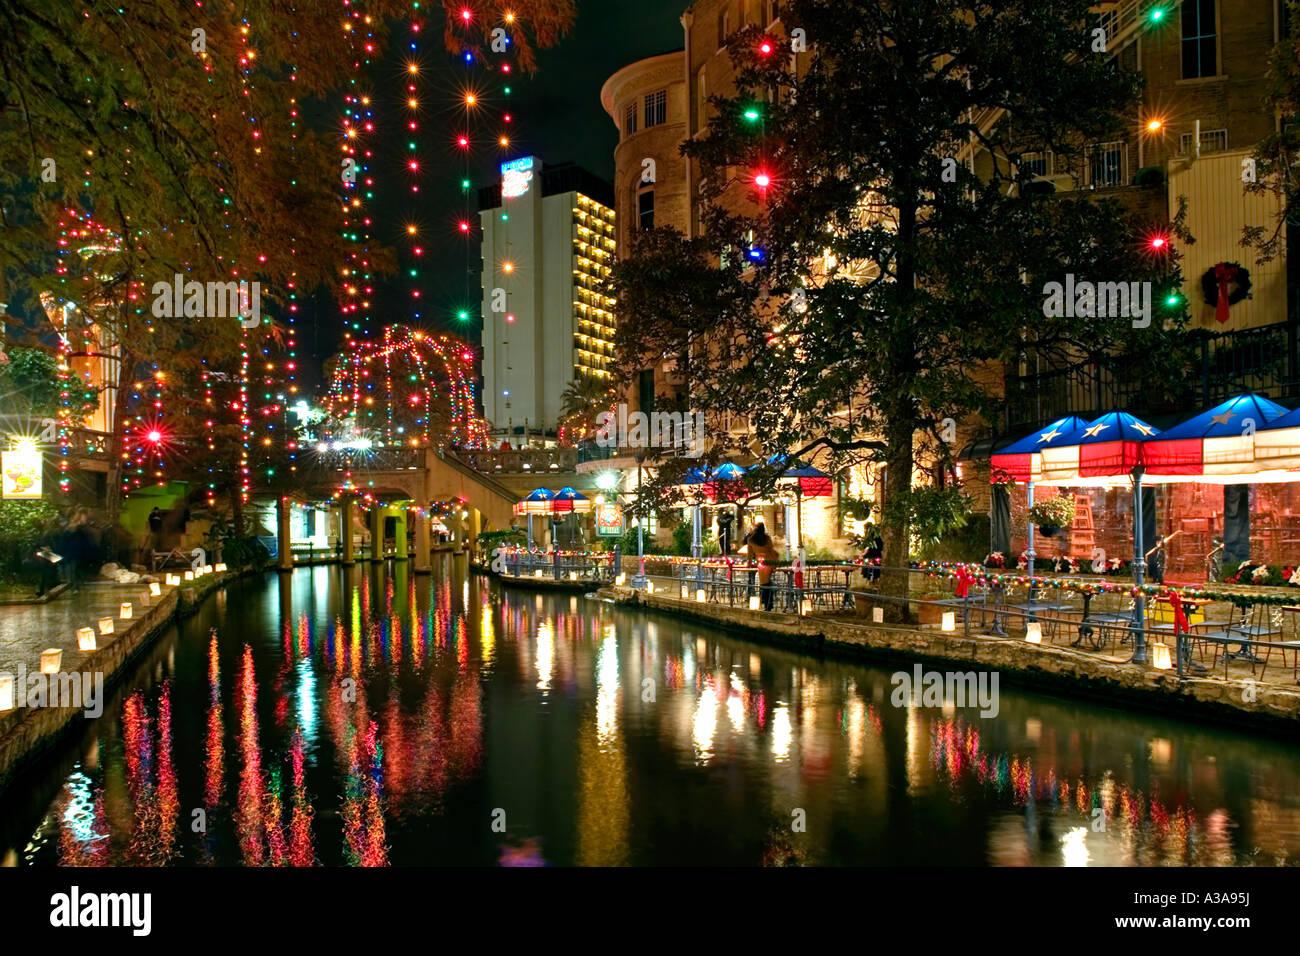 Riverwalk San Antonio Christmas.San Antonio Texas River Walk At Night With Christmas Lights